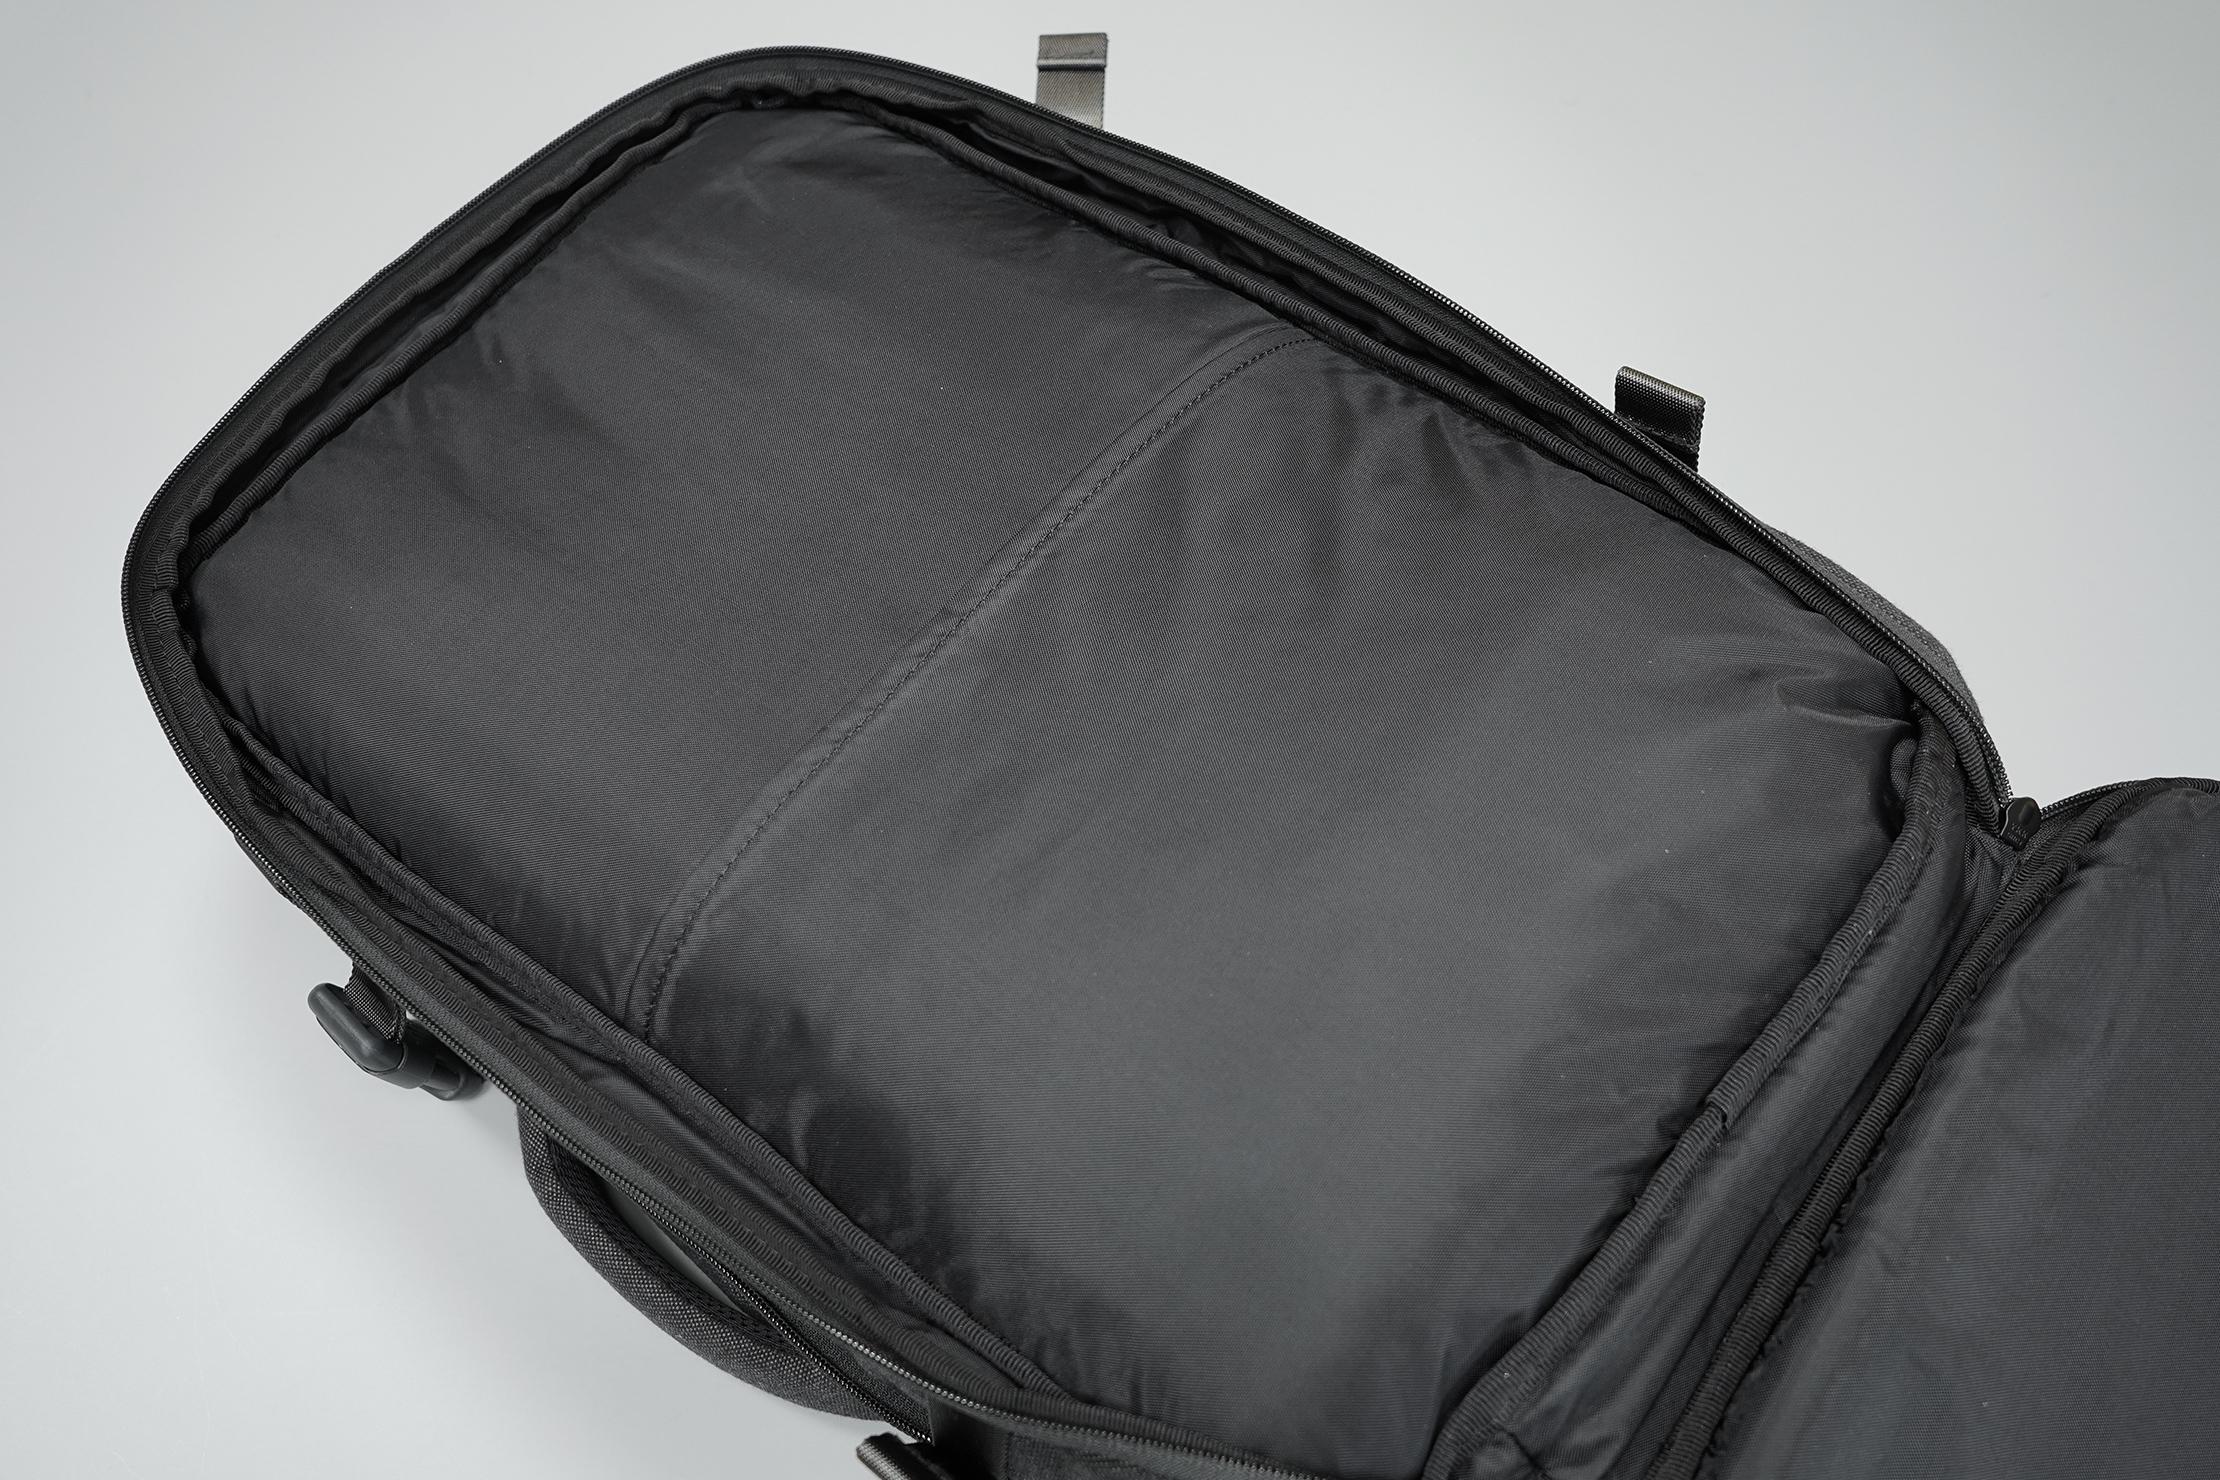 Incase EO Travel Backpack Laptop Compartment Liner Pocket